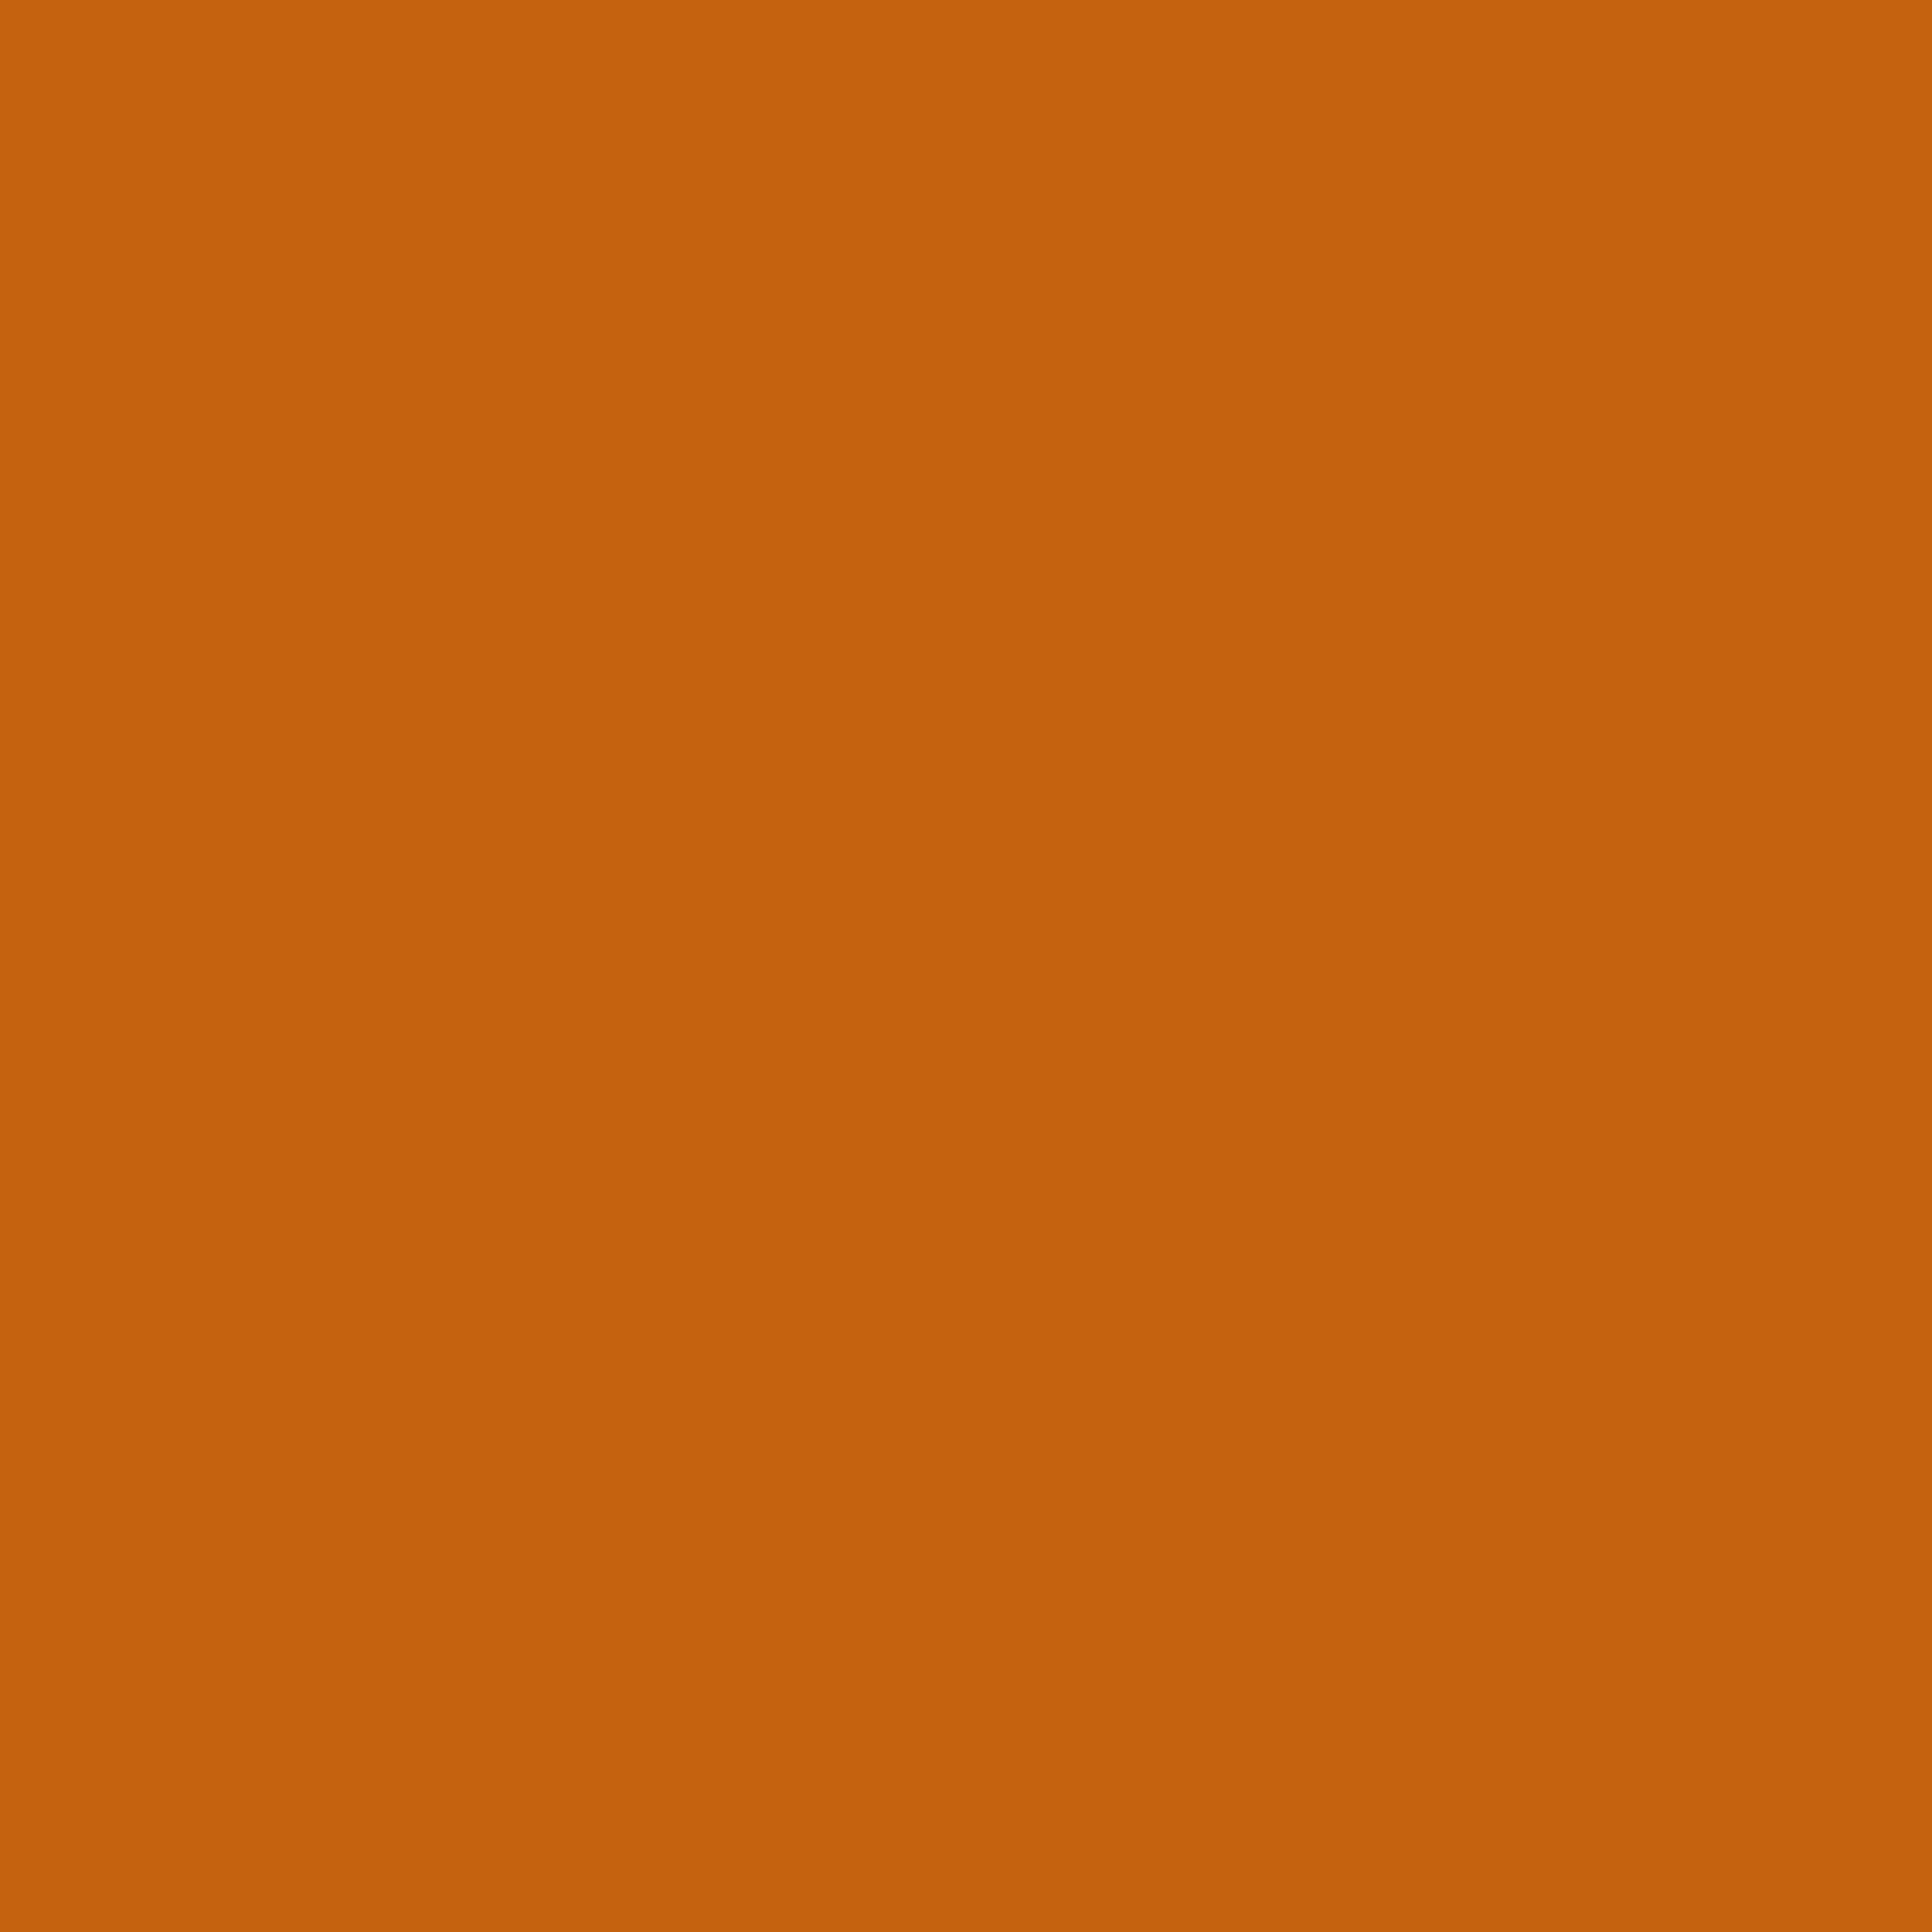 2048x2048 Alloy Orange Solid Color Background